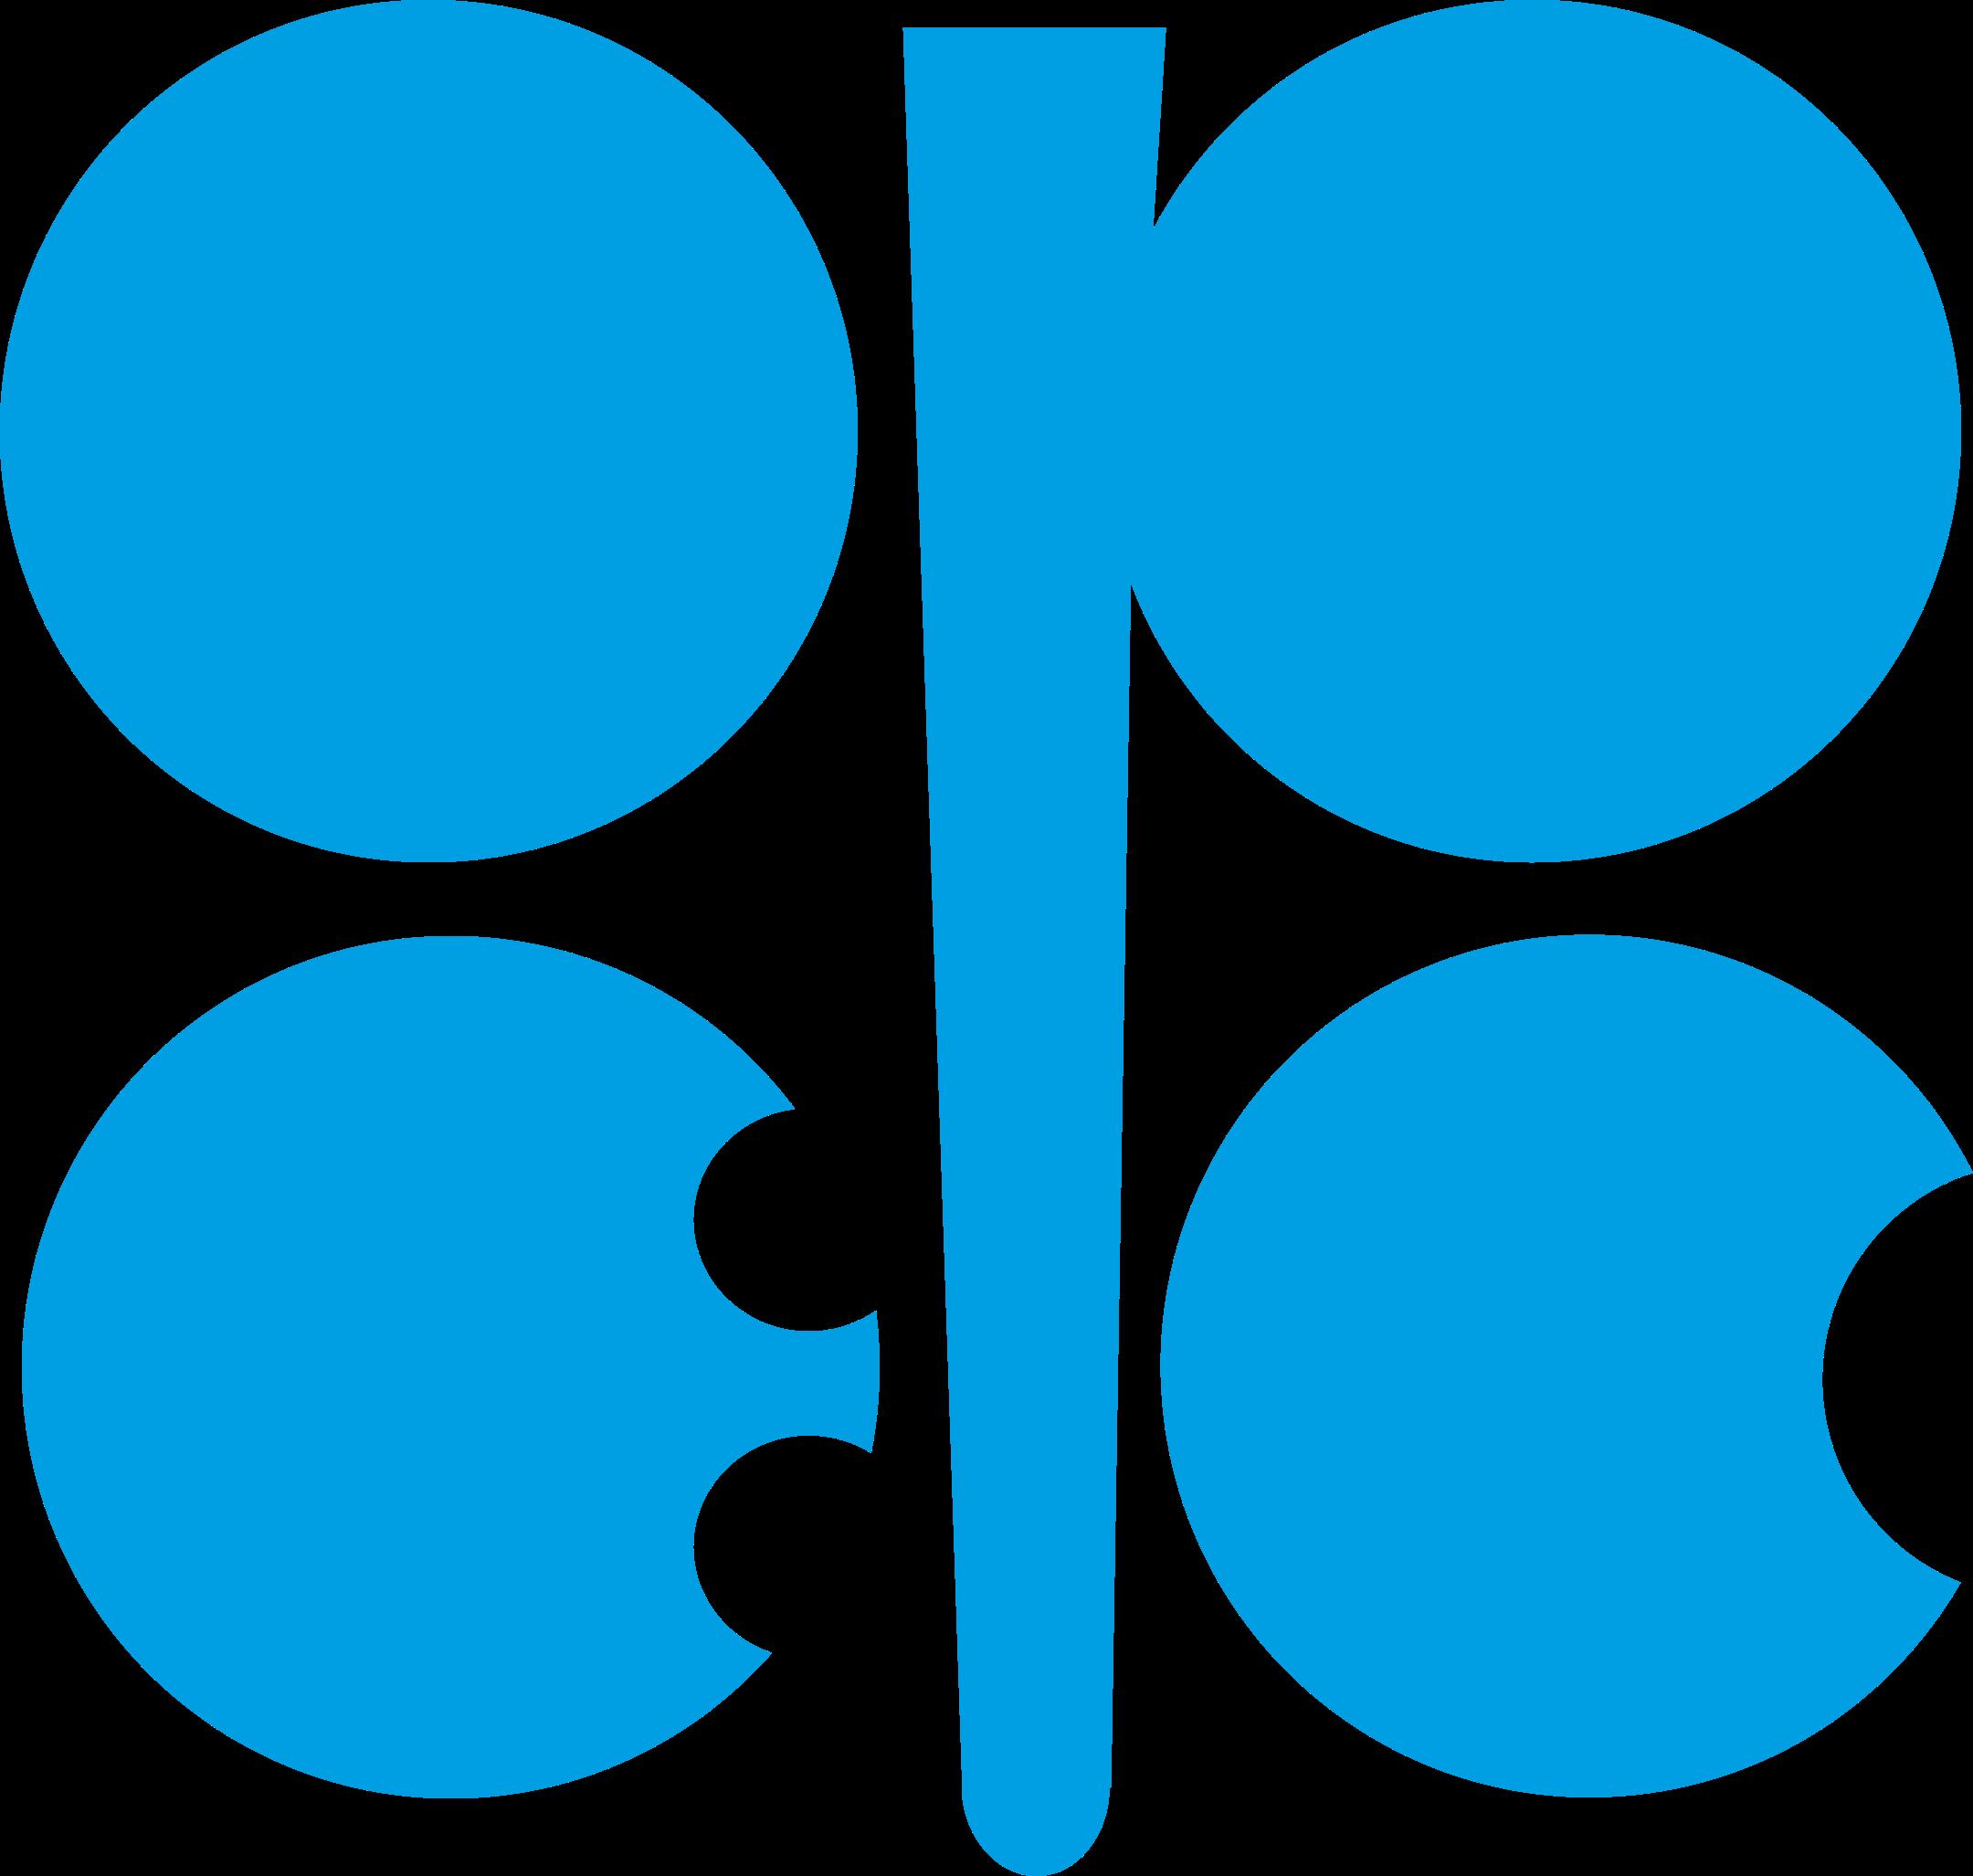 opec logo 1 - OPEC Logo